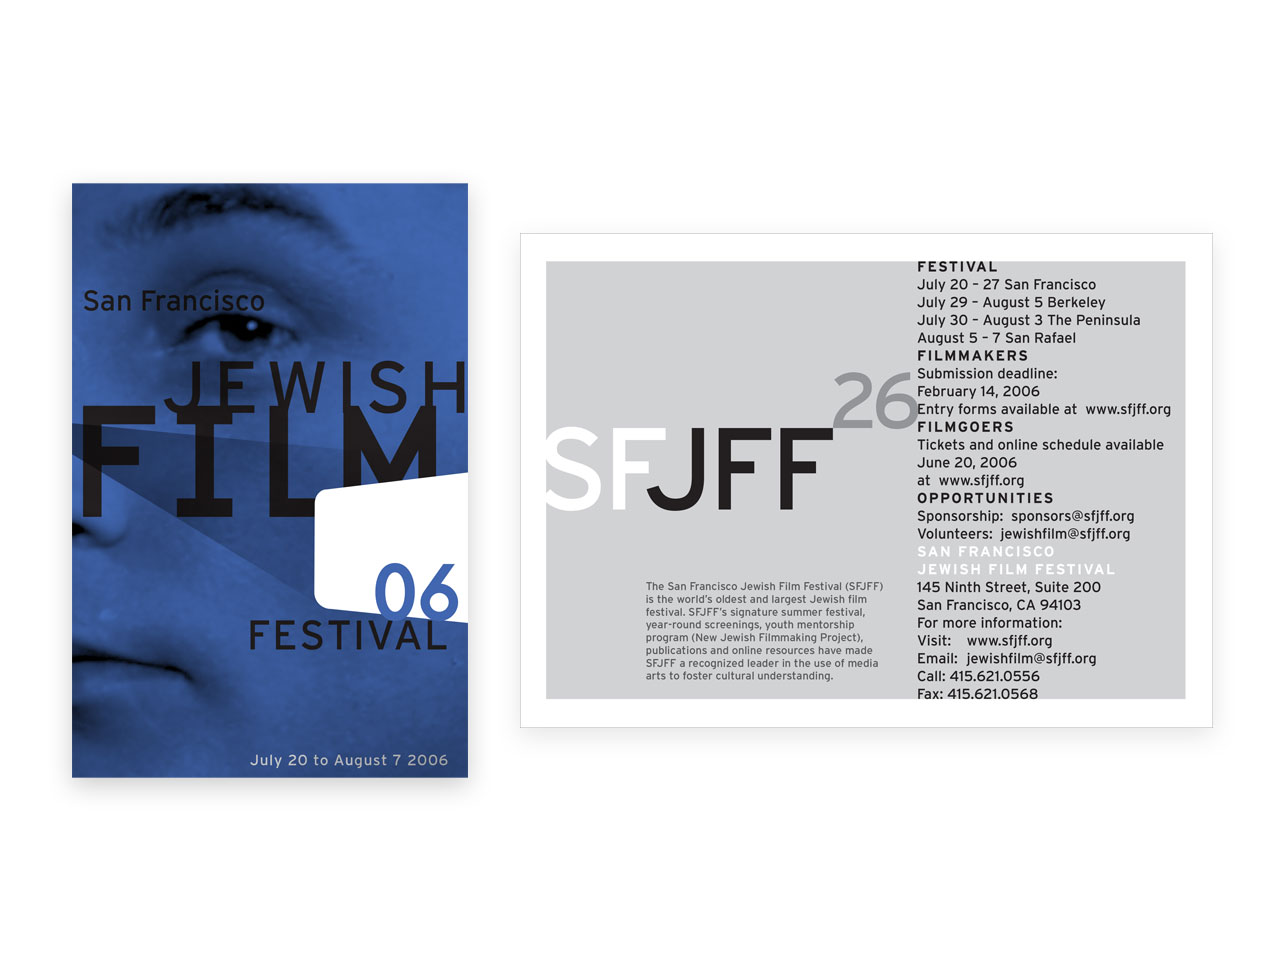 jff_ten_01